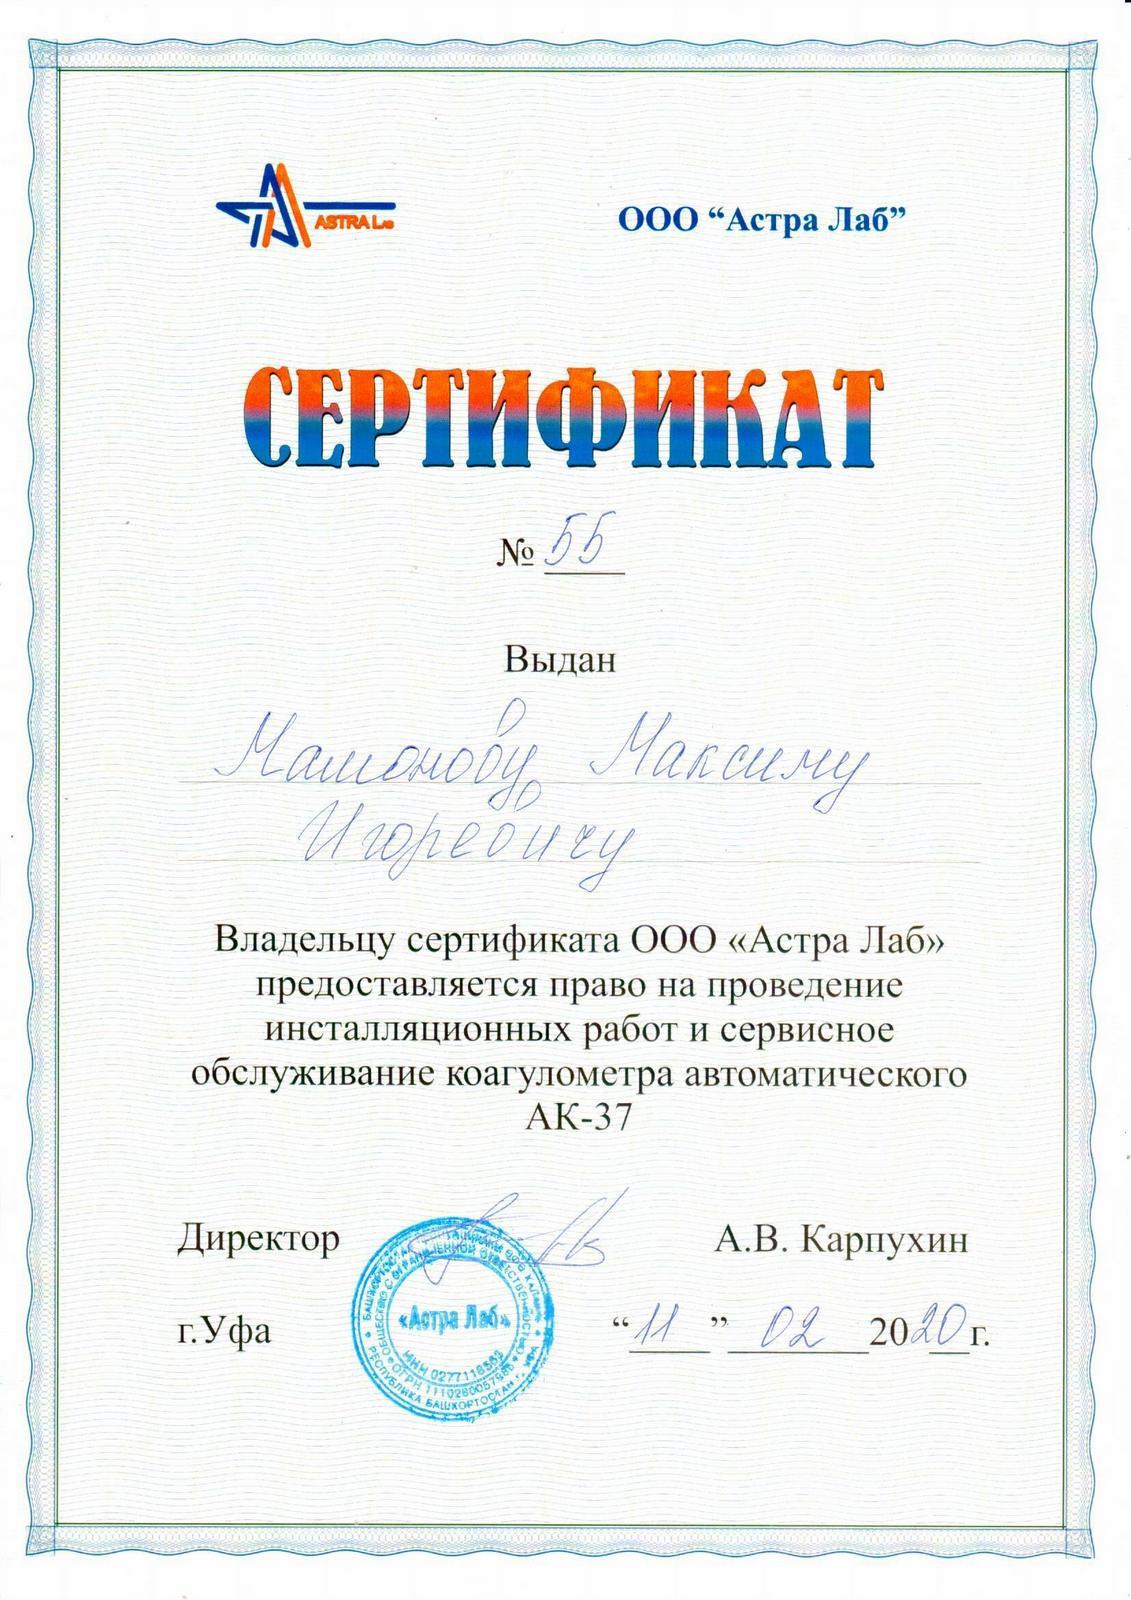 gemodializ - Astra-Lab-Mamonov-11.02.2020